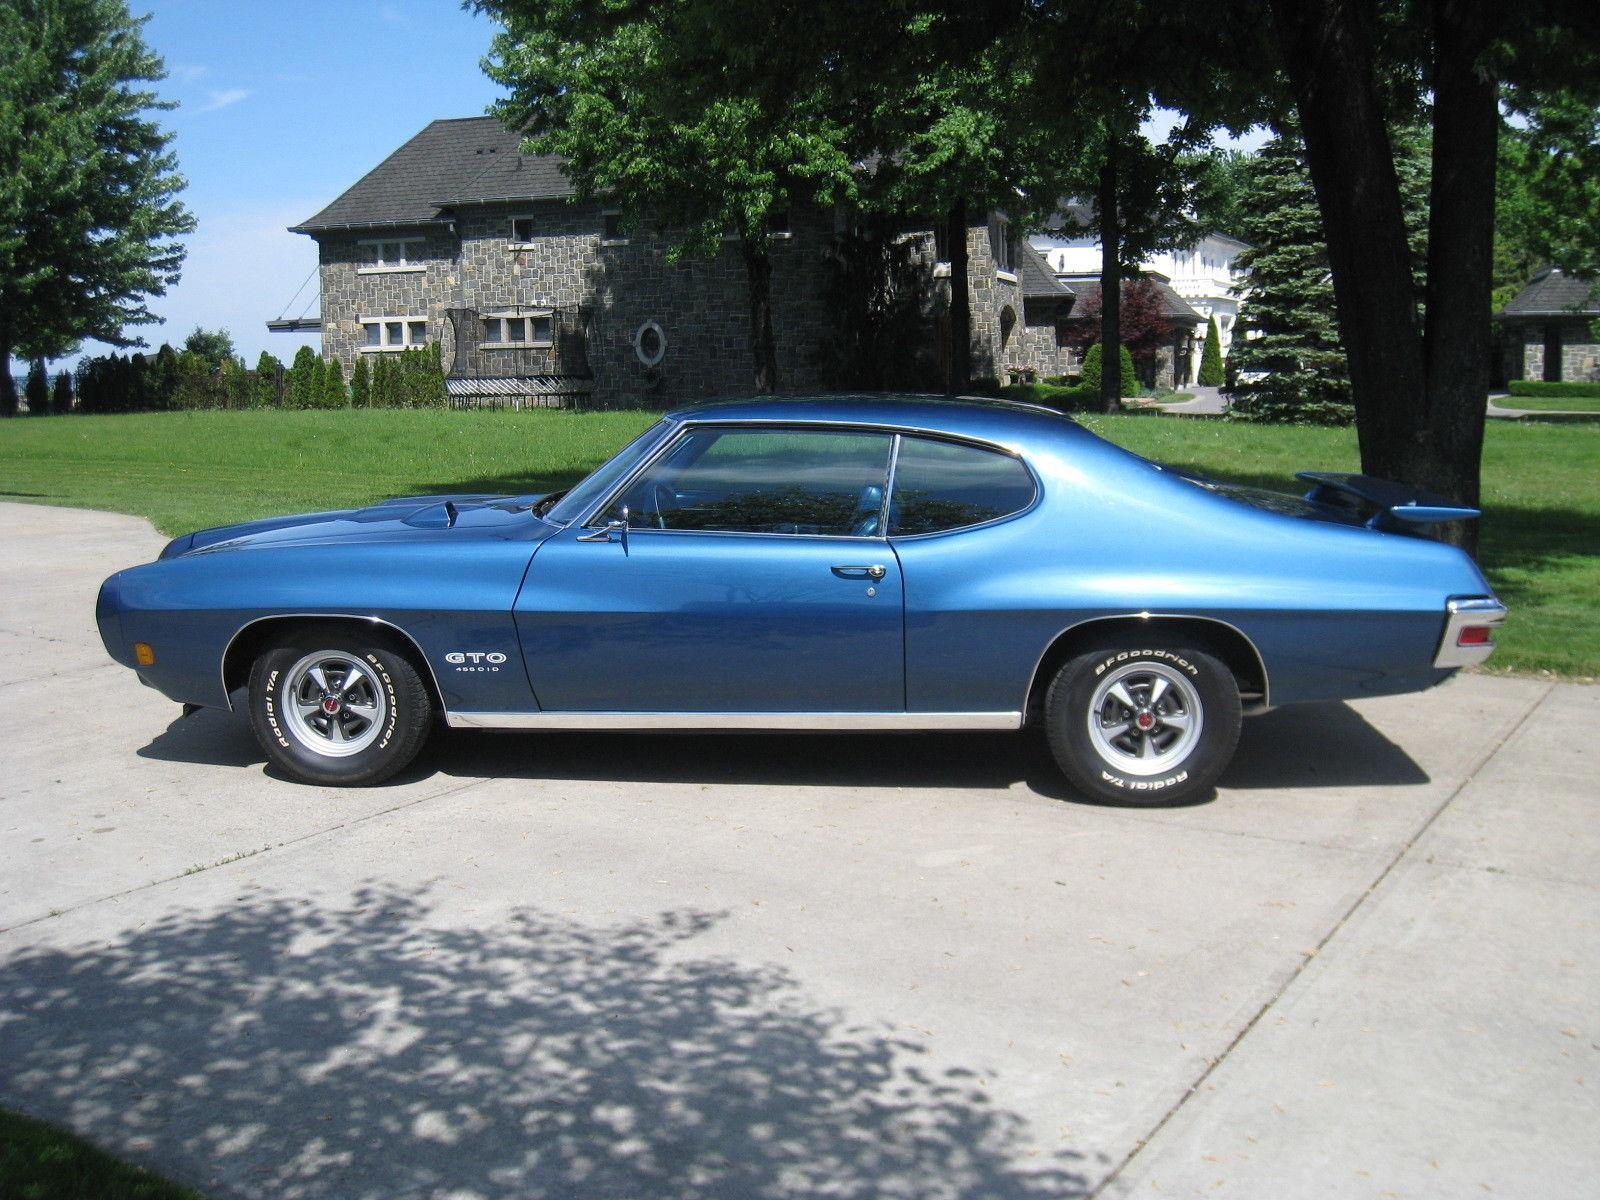 Auto Rotisserie For Sale Canada: 1970 GTO 455 HO Rare California Emissions Car Rust Free